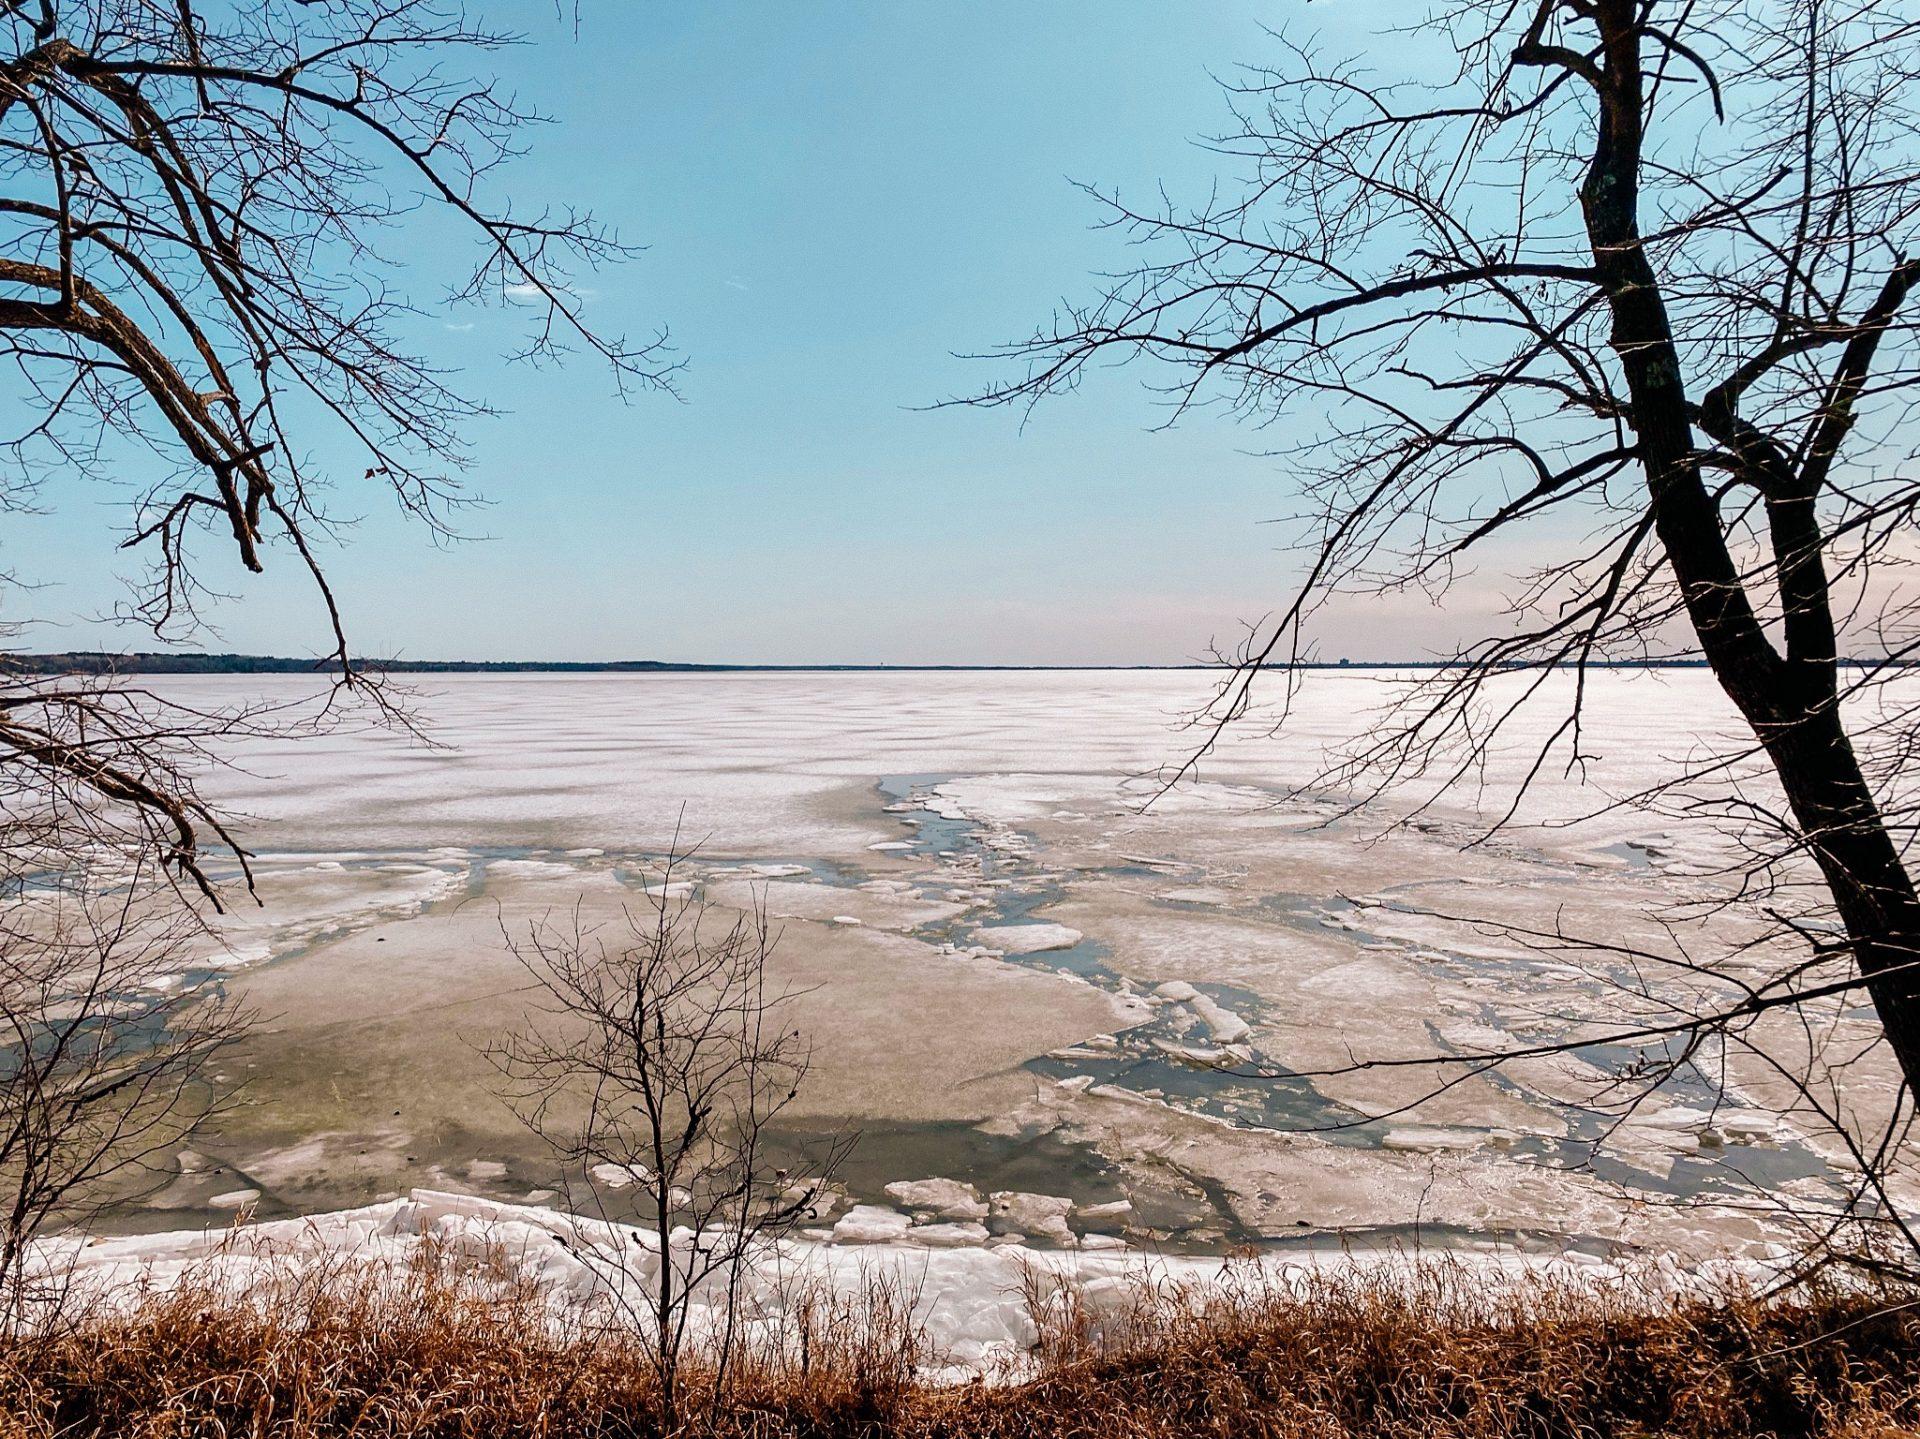 The ice coming off of Lake Bemidji in Minnesota in April.